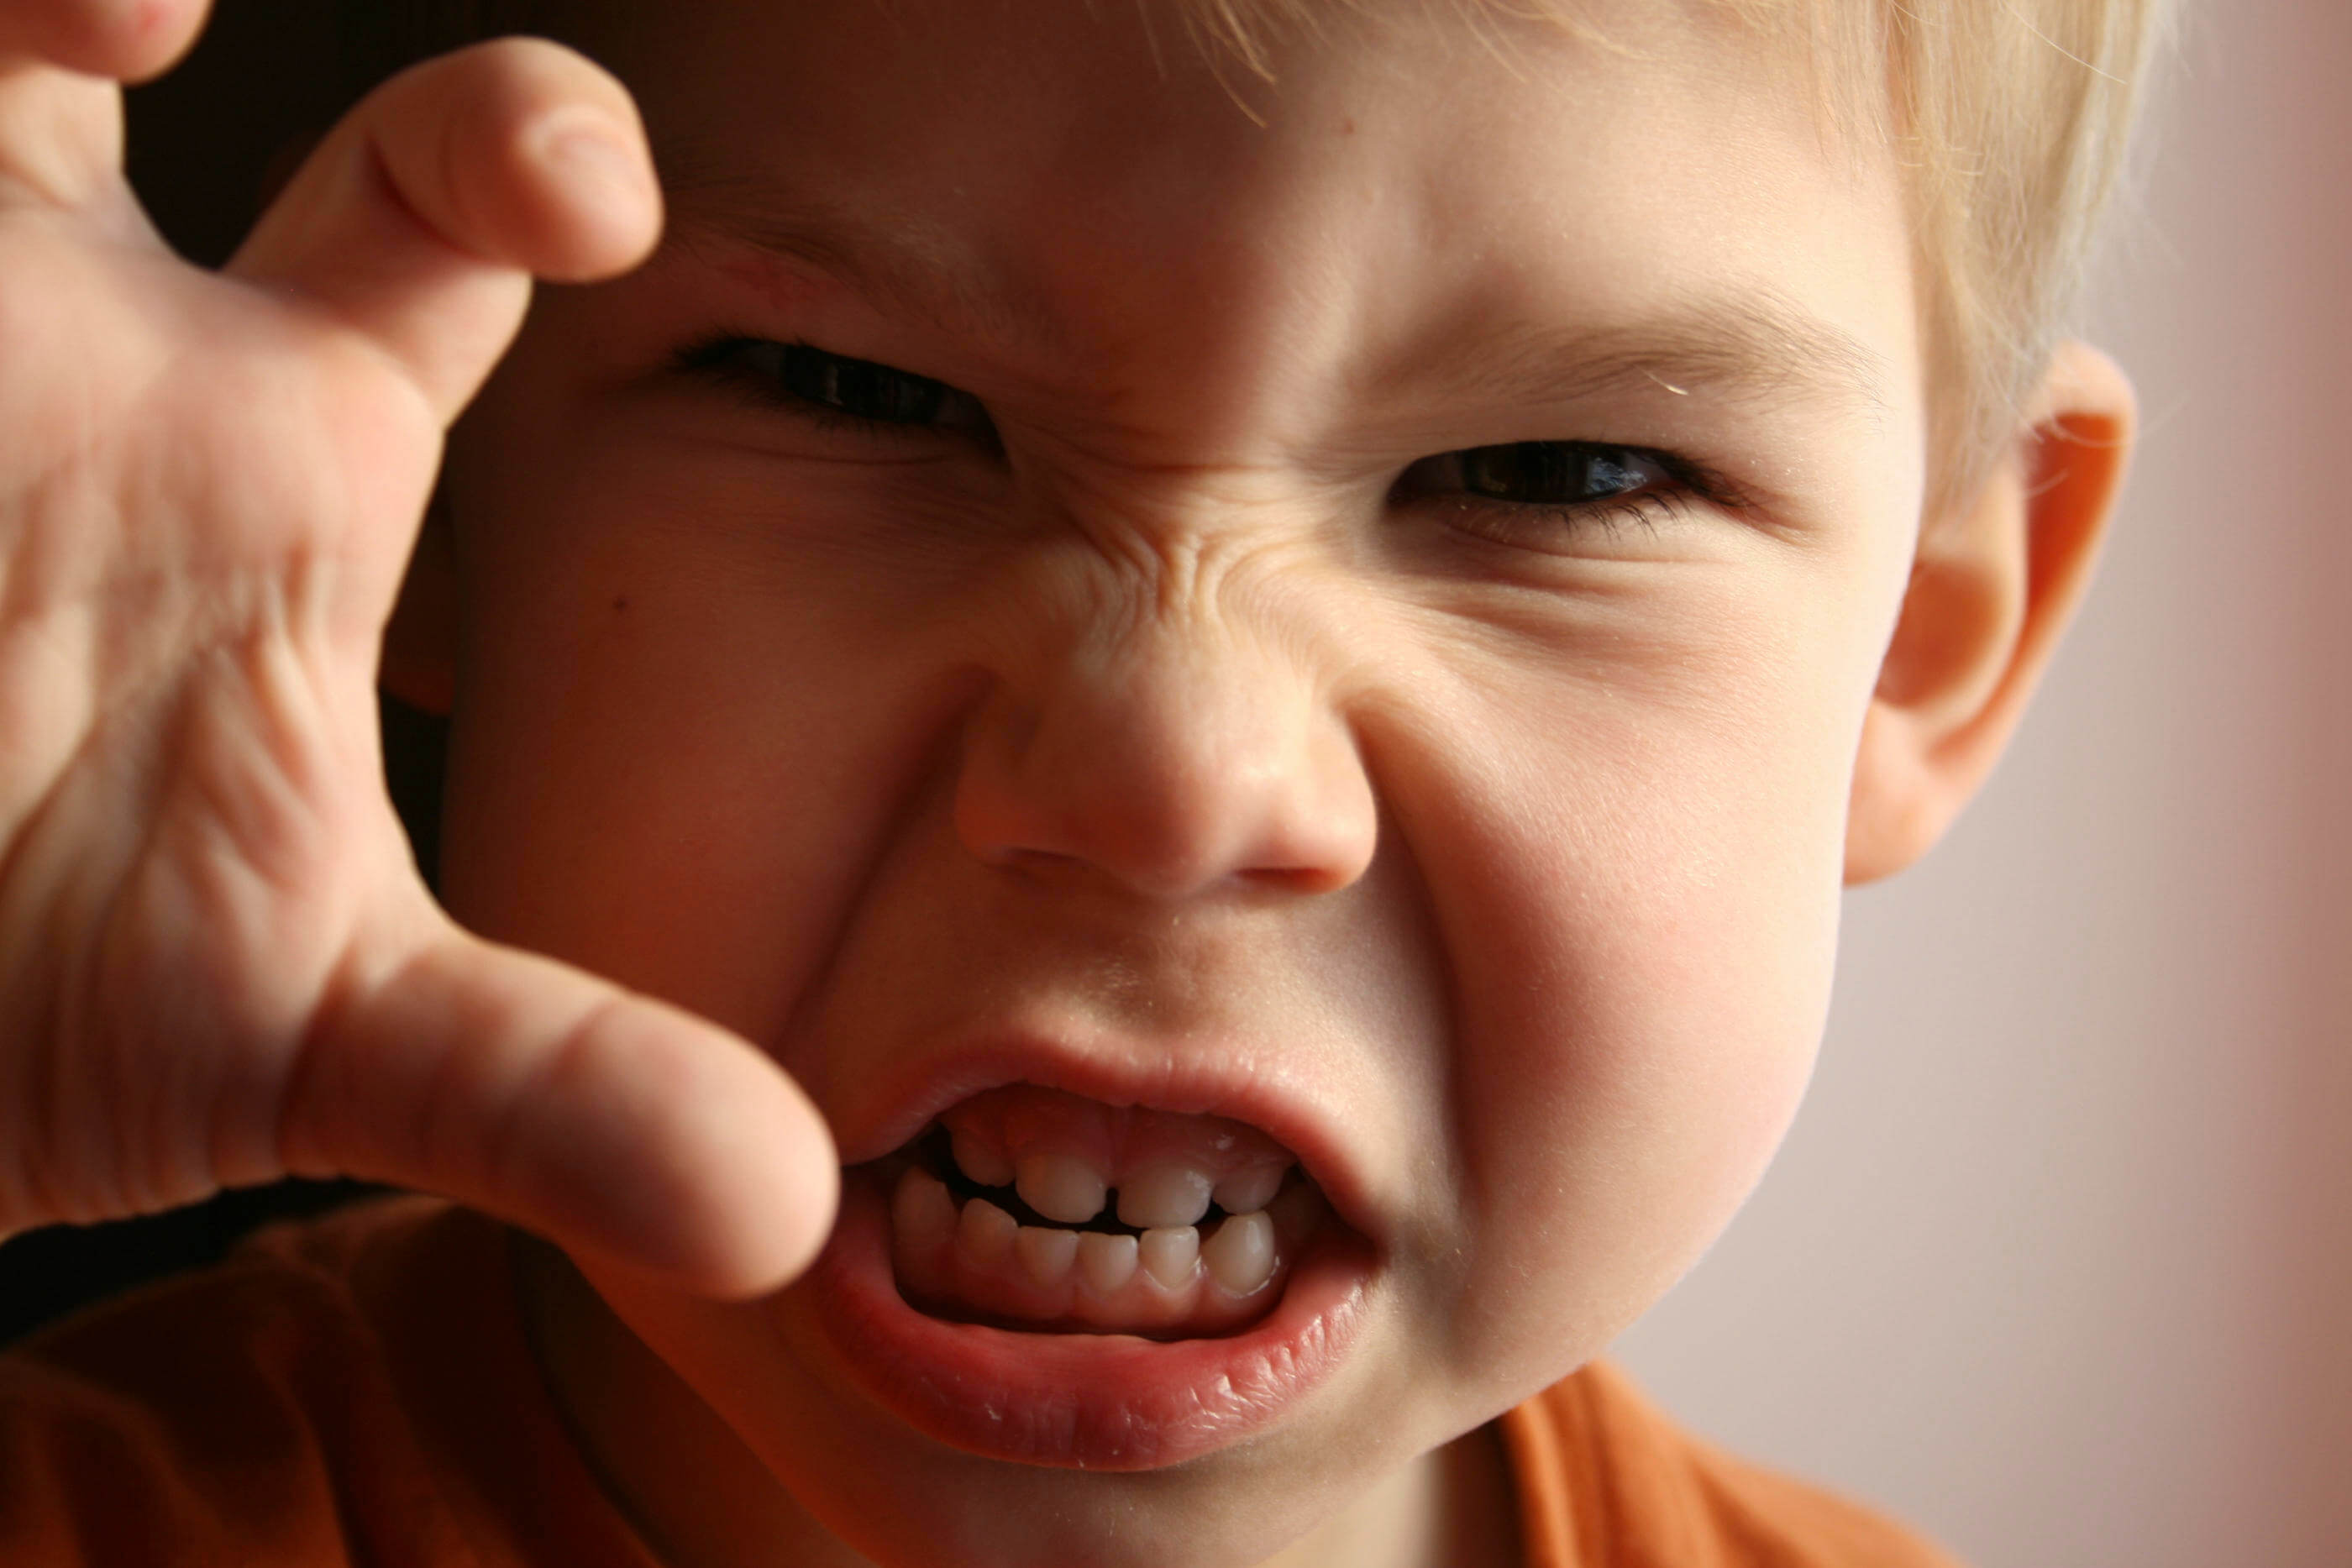 criança com raiva